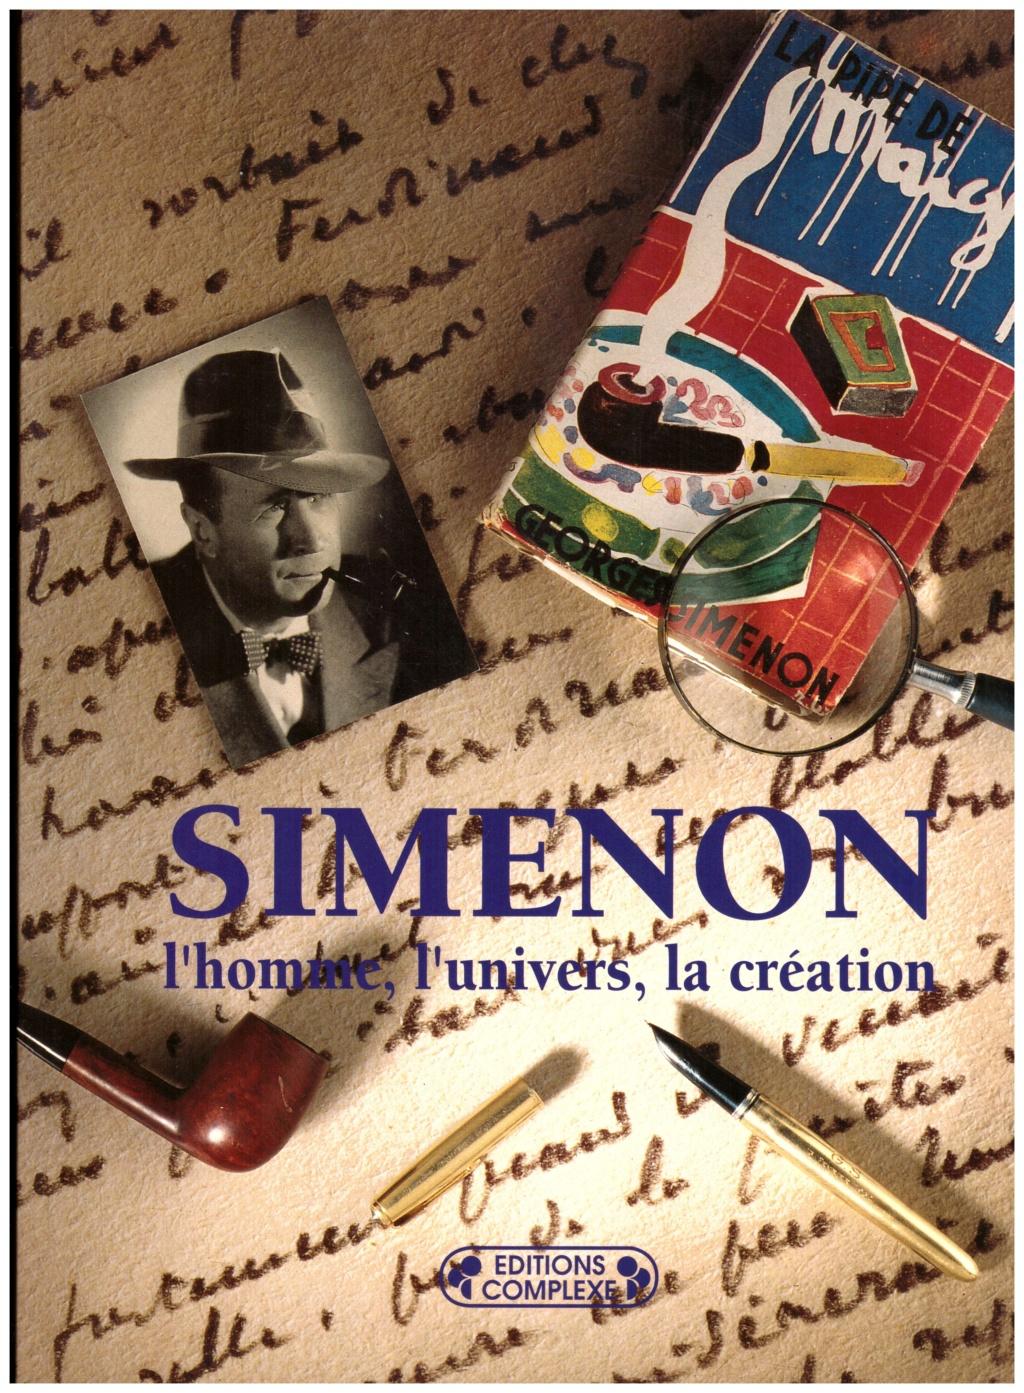 Georges Simenon - Page 2 Num_2061